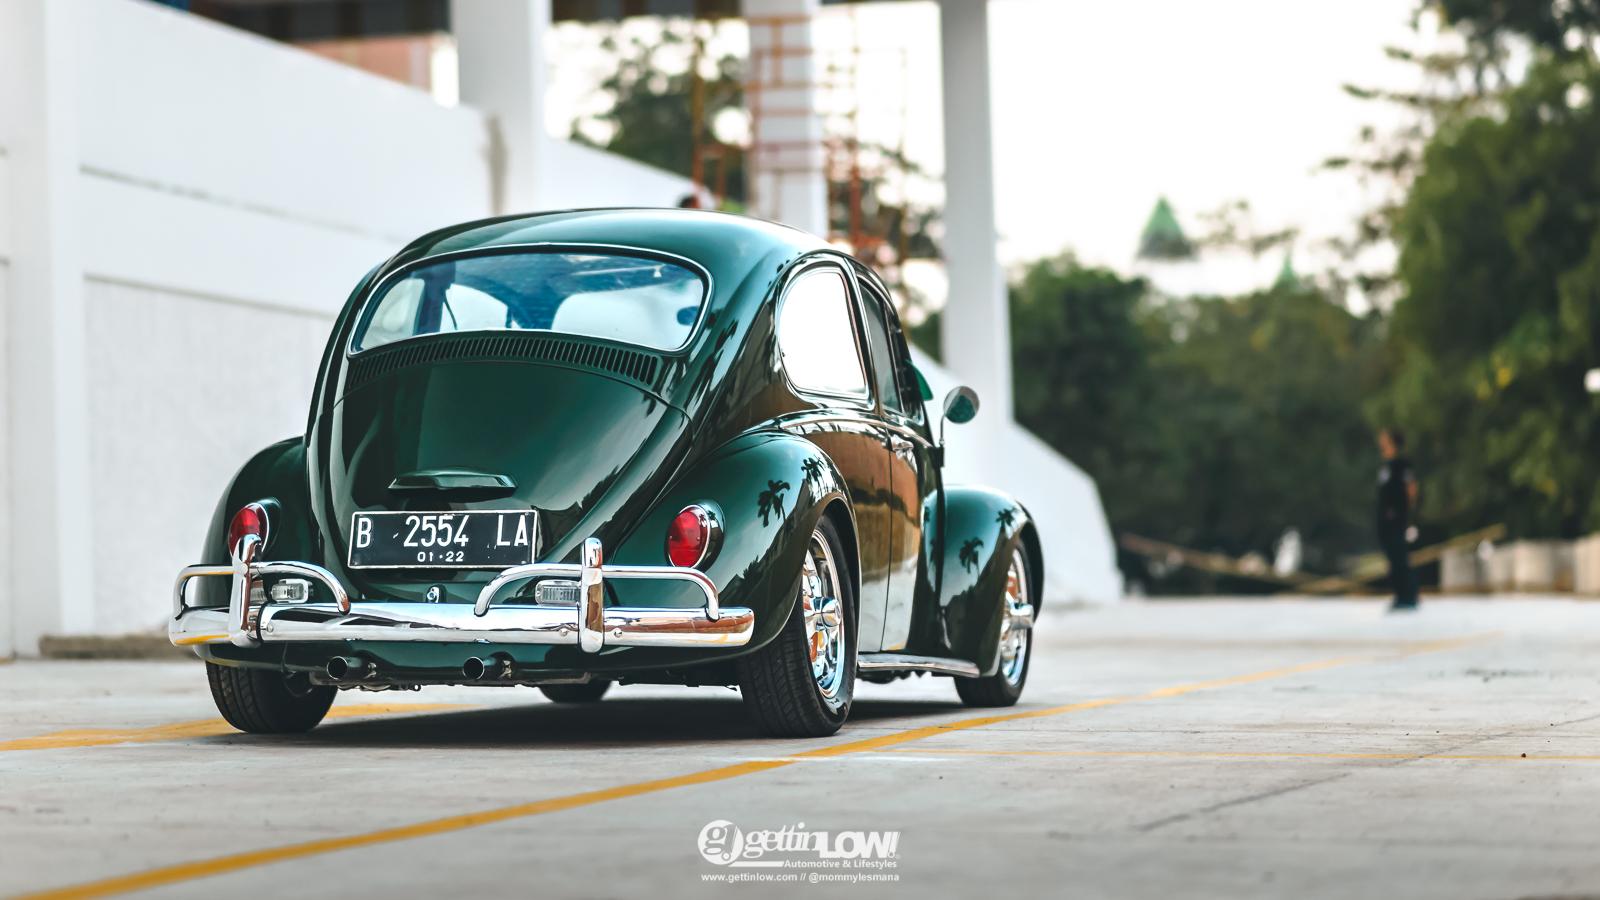 Riyanto Imam's 1966 VW Beetle